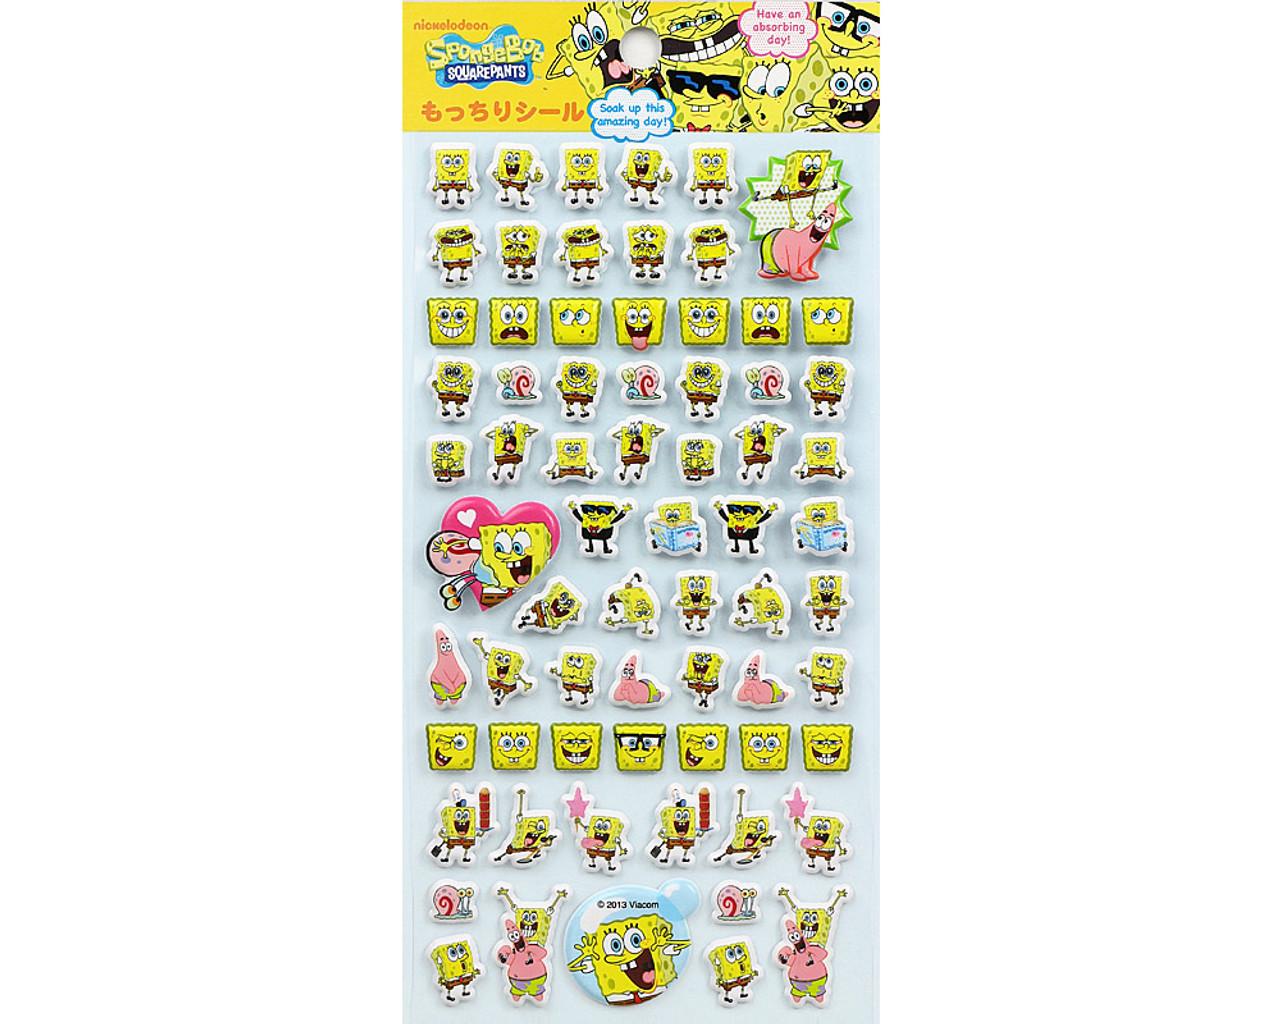 SpongeBob Happy Face Puffy Sticker 19890-13GAE ( Front View )